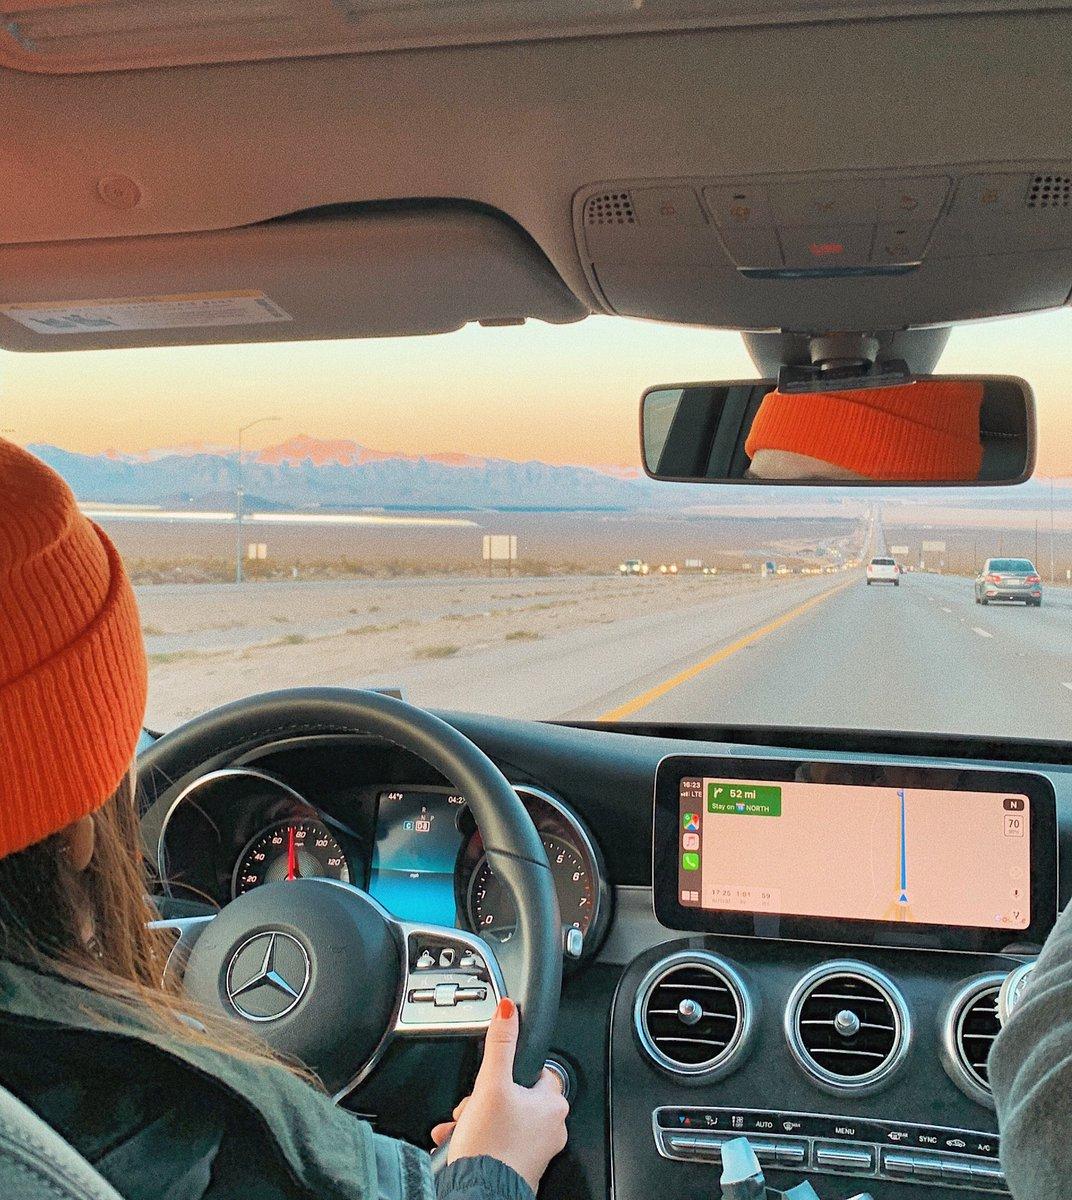 miss being on the road - anybody who enjoys driving like me?  . #travelholic #roadtripusa #roadtrips #globetrotter #traveladdict #travelling #travelvibes #travelbook #travelbloggers #travelcommunity #travelbloggers #travelblog #travelguide #wanderlust #traveldestinationpic.twitter.com/oM5Q8ZSuGp